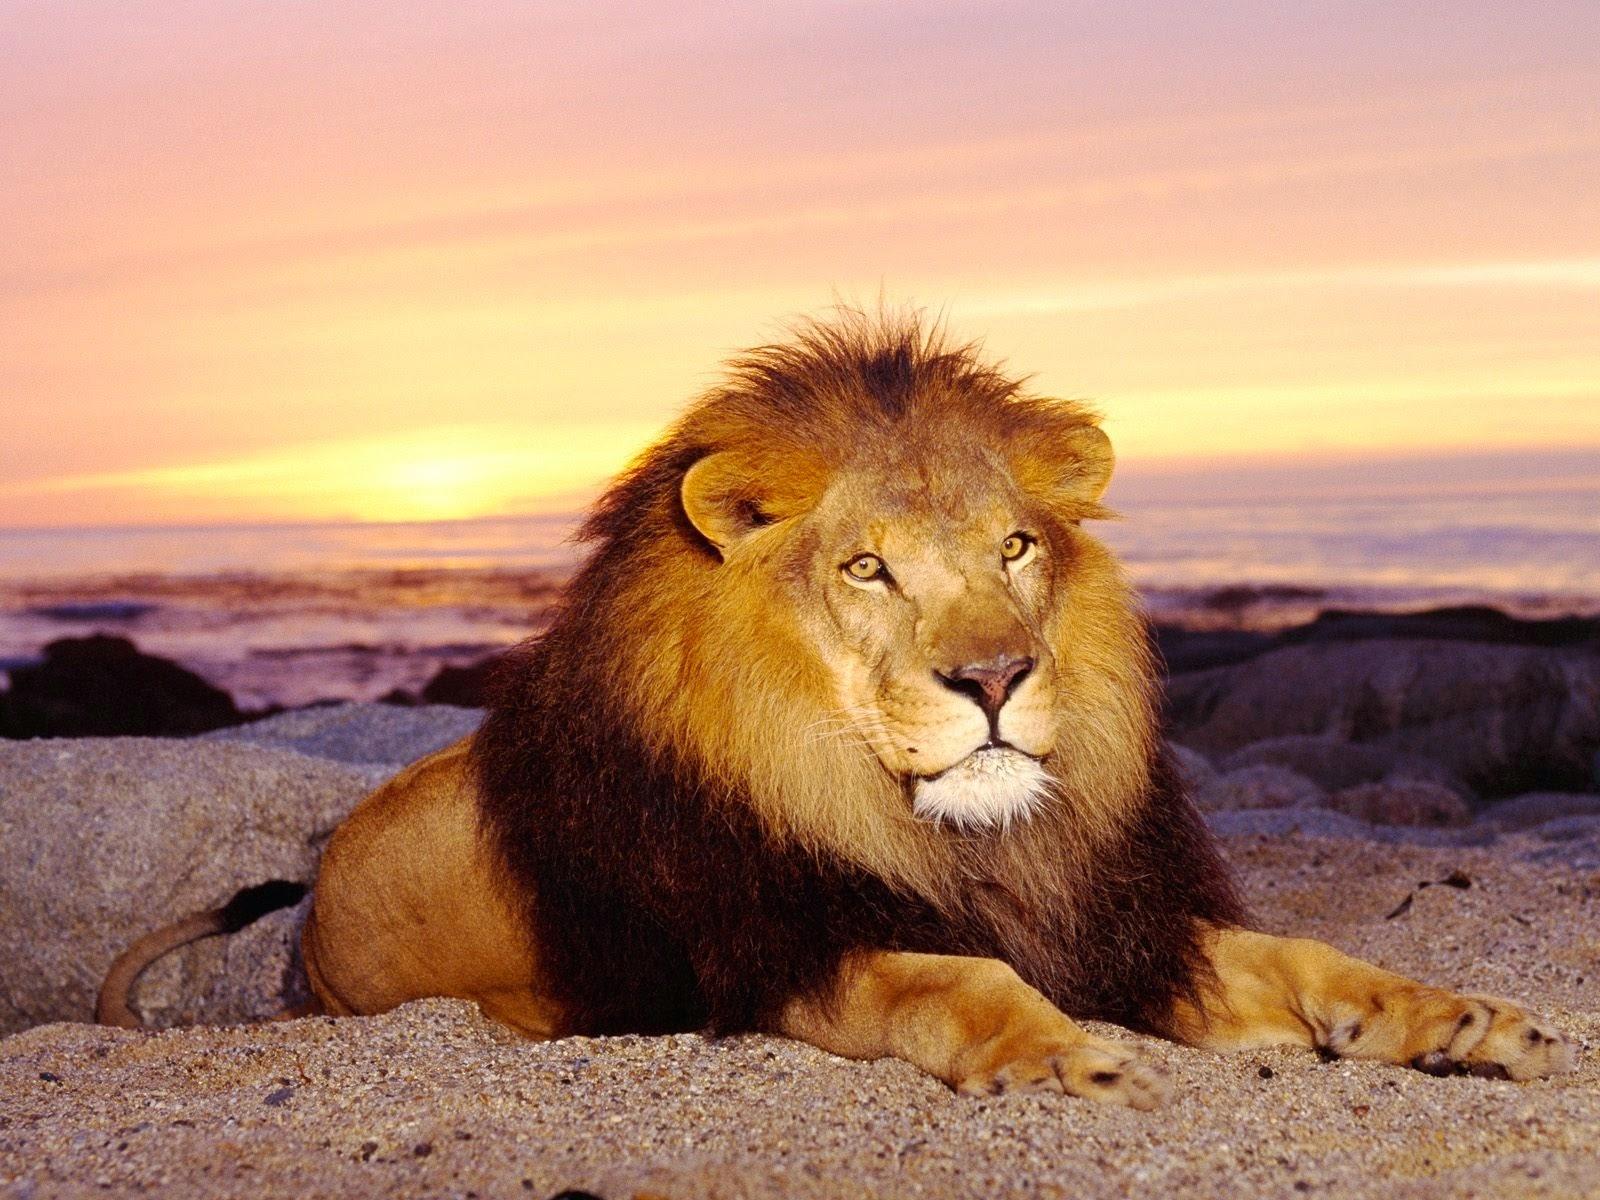 Gambar Singa Nama Gambar Binatang Wallpaper Mengaum